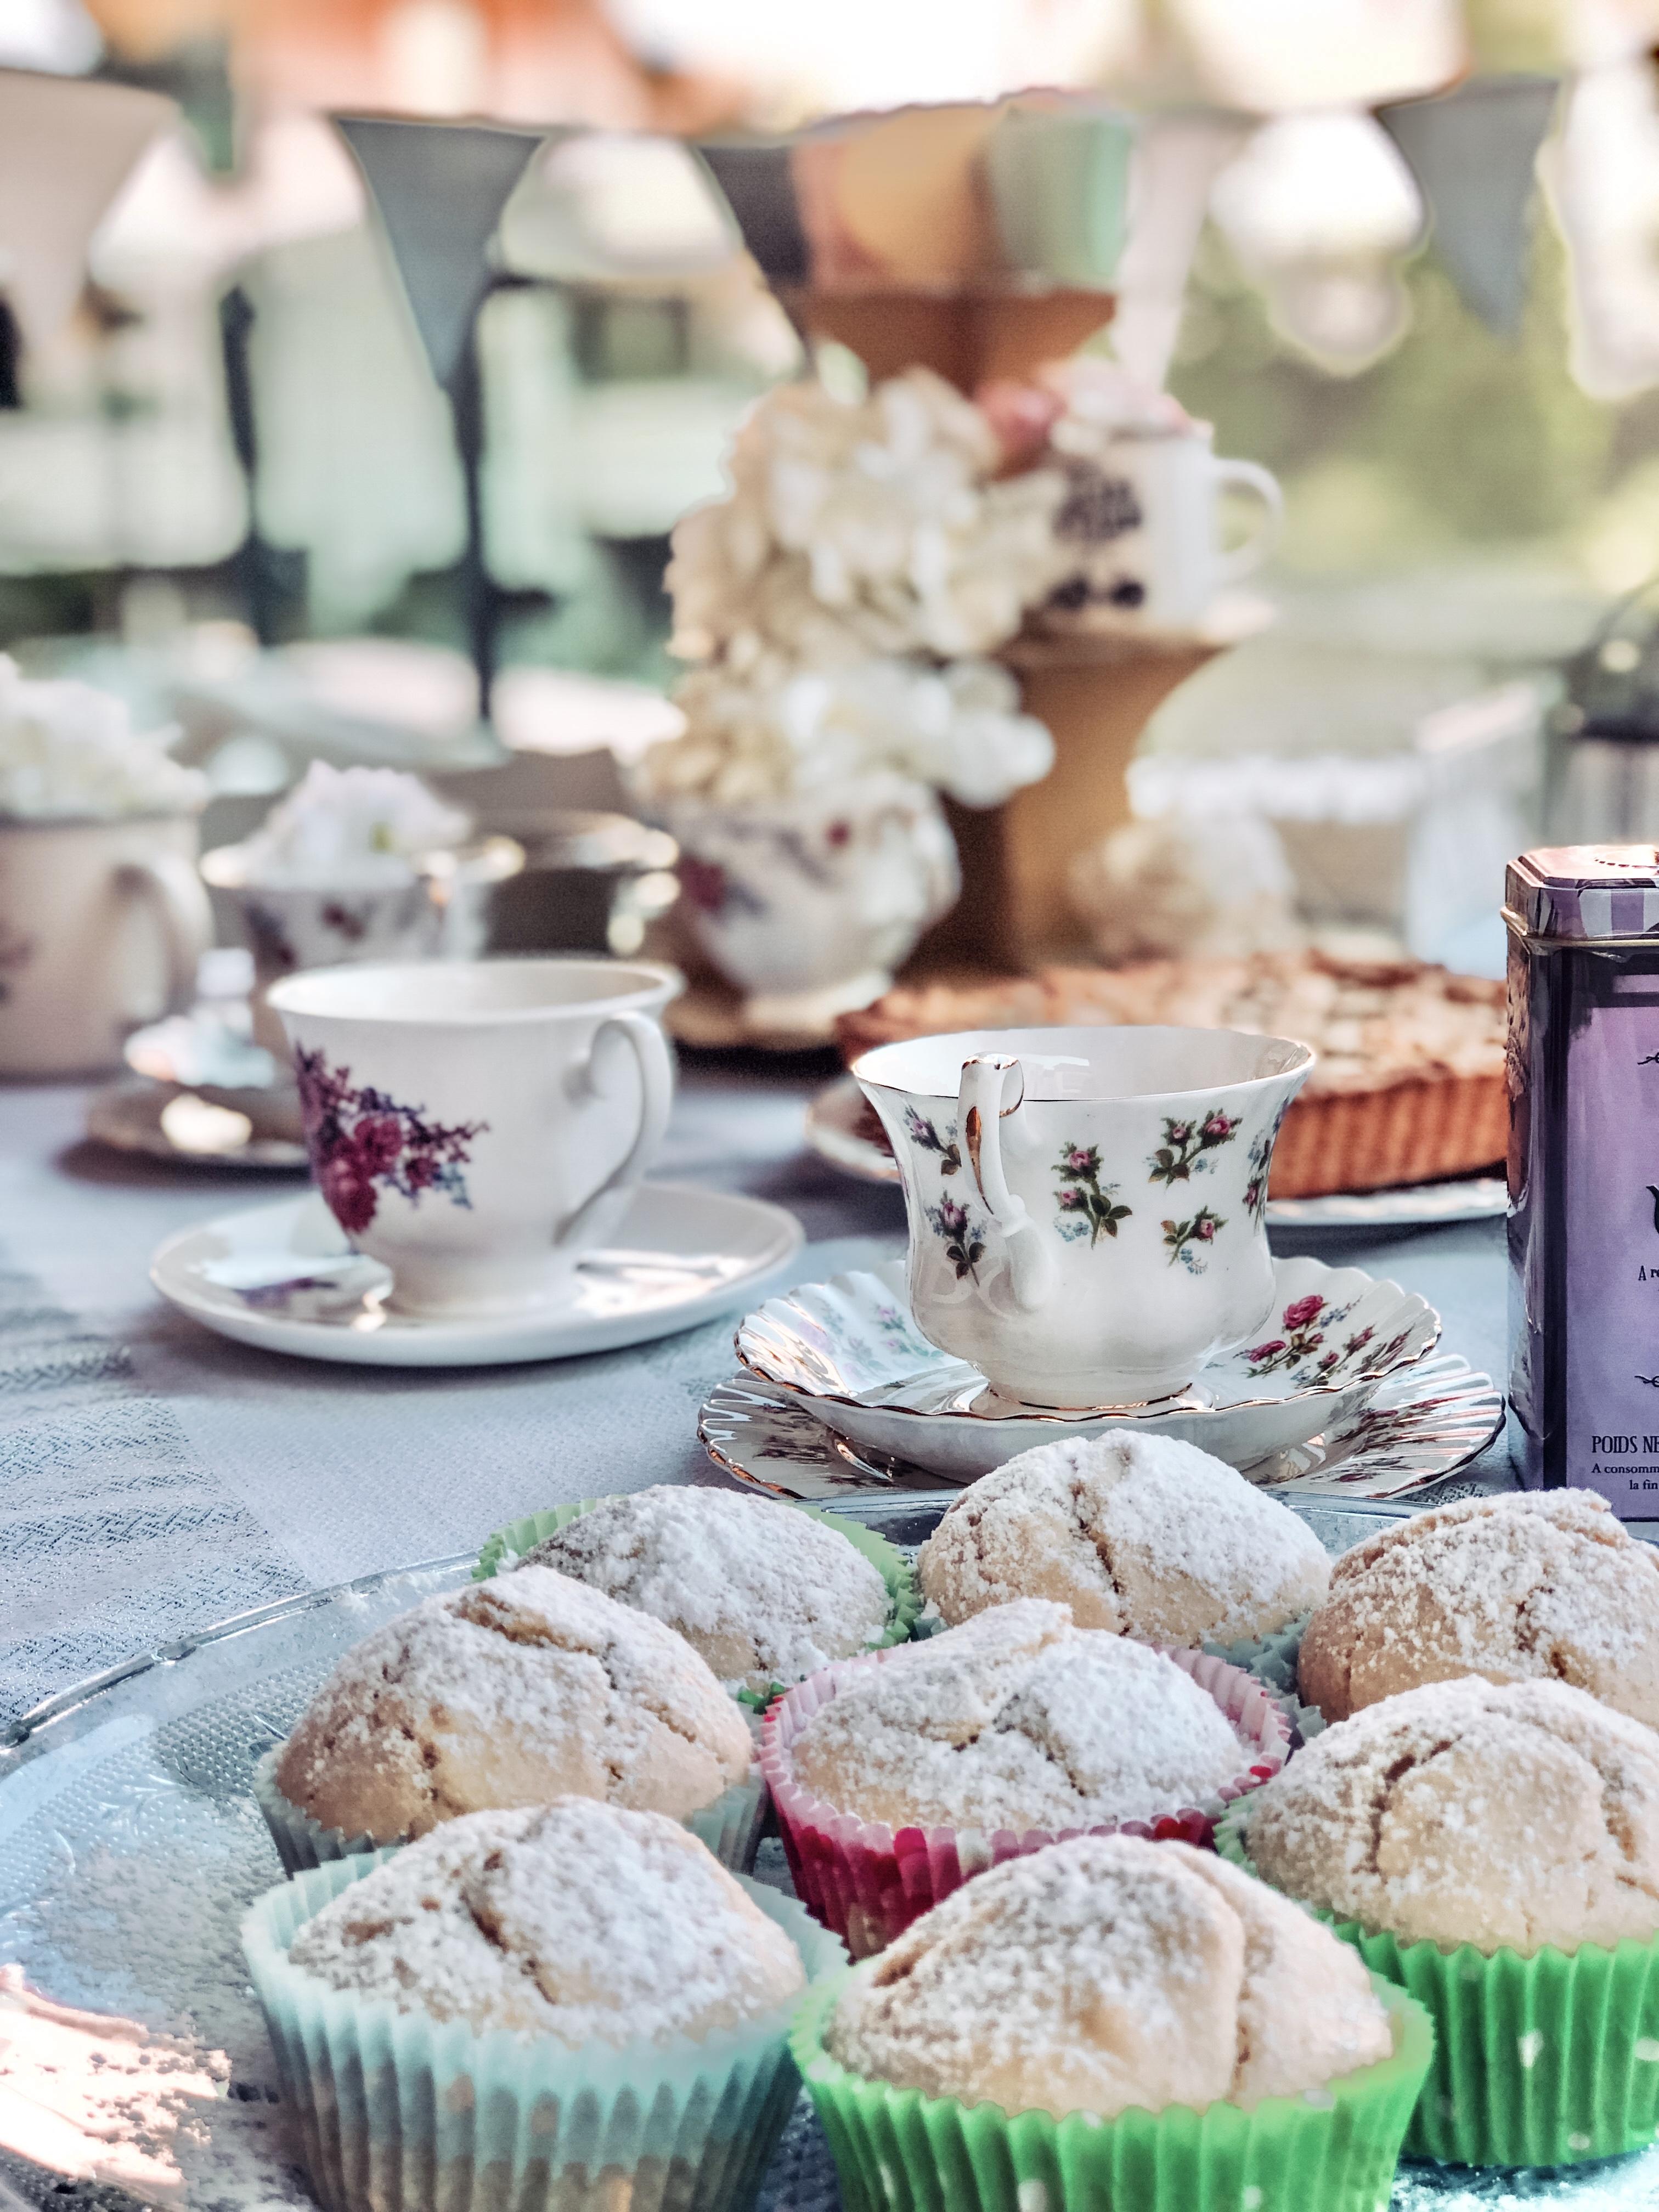 scones, scones senza latte, afternoon tea, impastastorie ricette, impastastorie bistrot, dolci inglesi